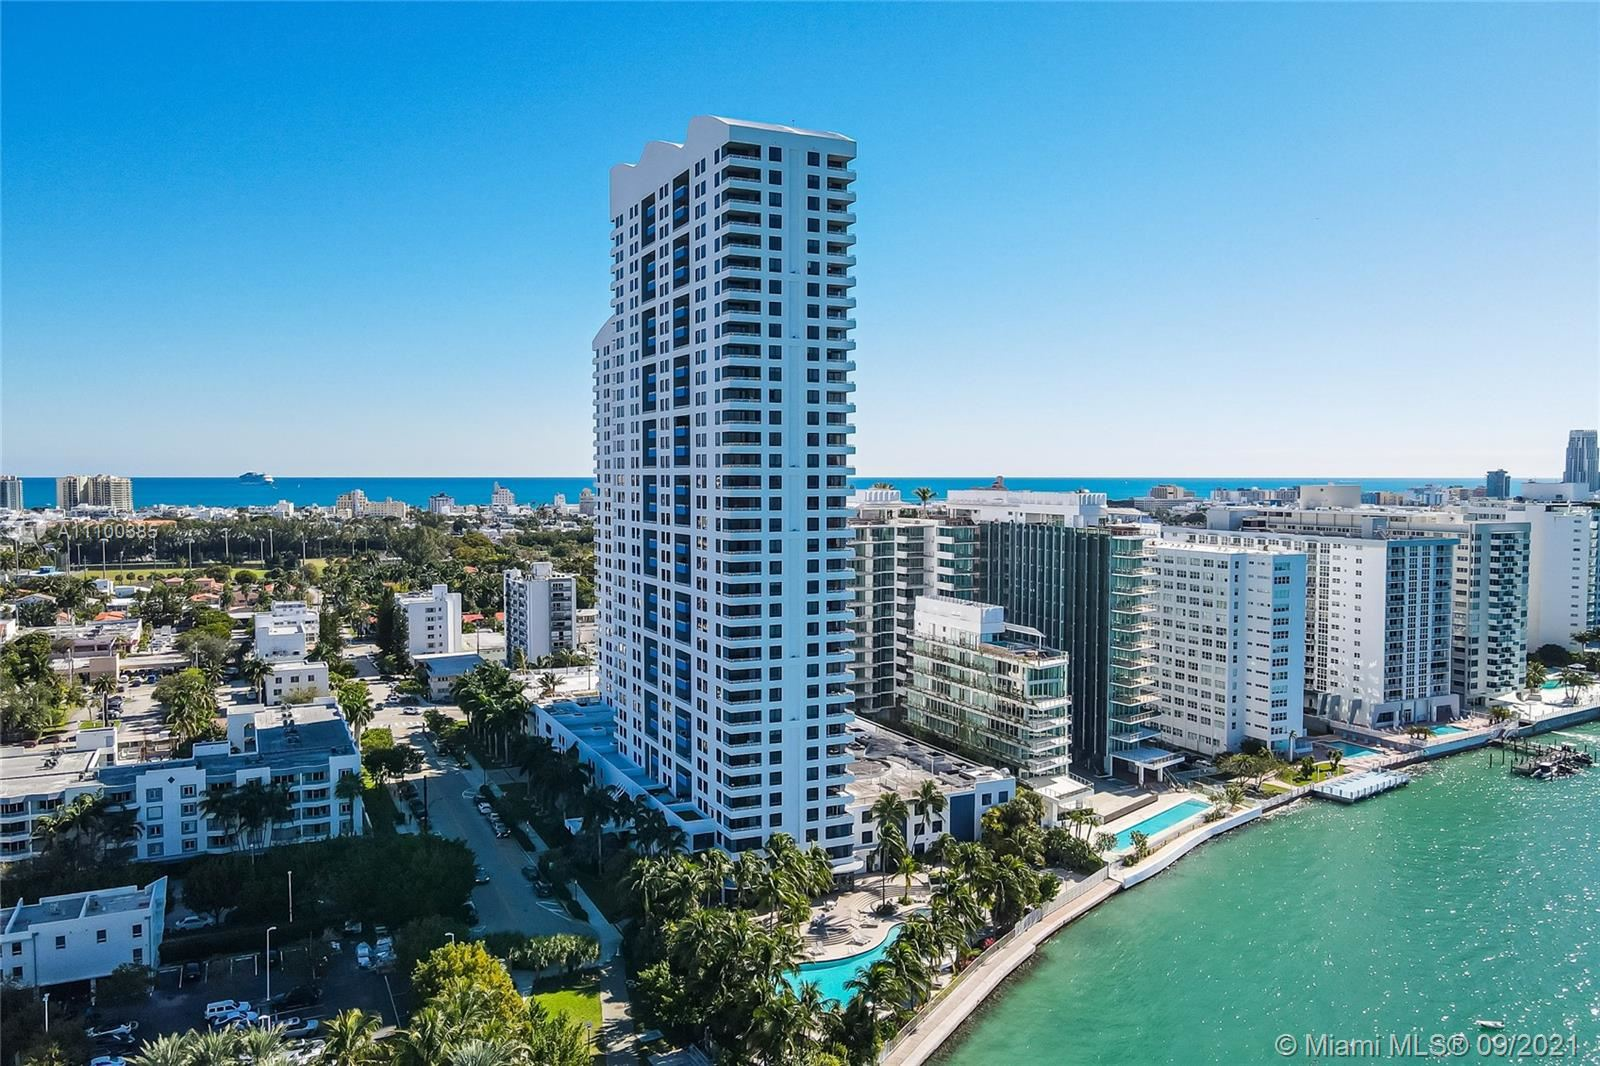 1330 West Ave #2105, Miami Beach, FL 33139 - #: A11100385